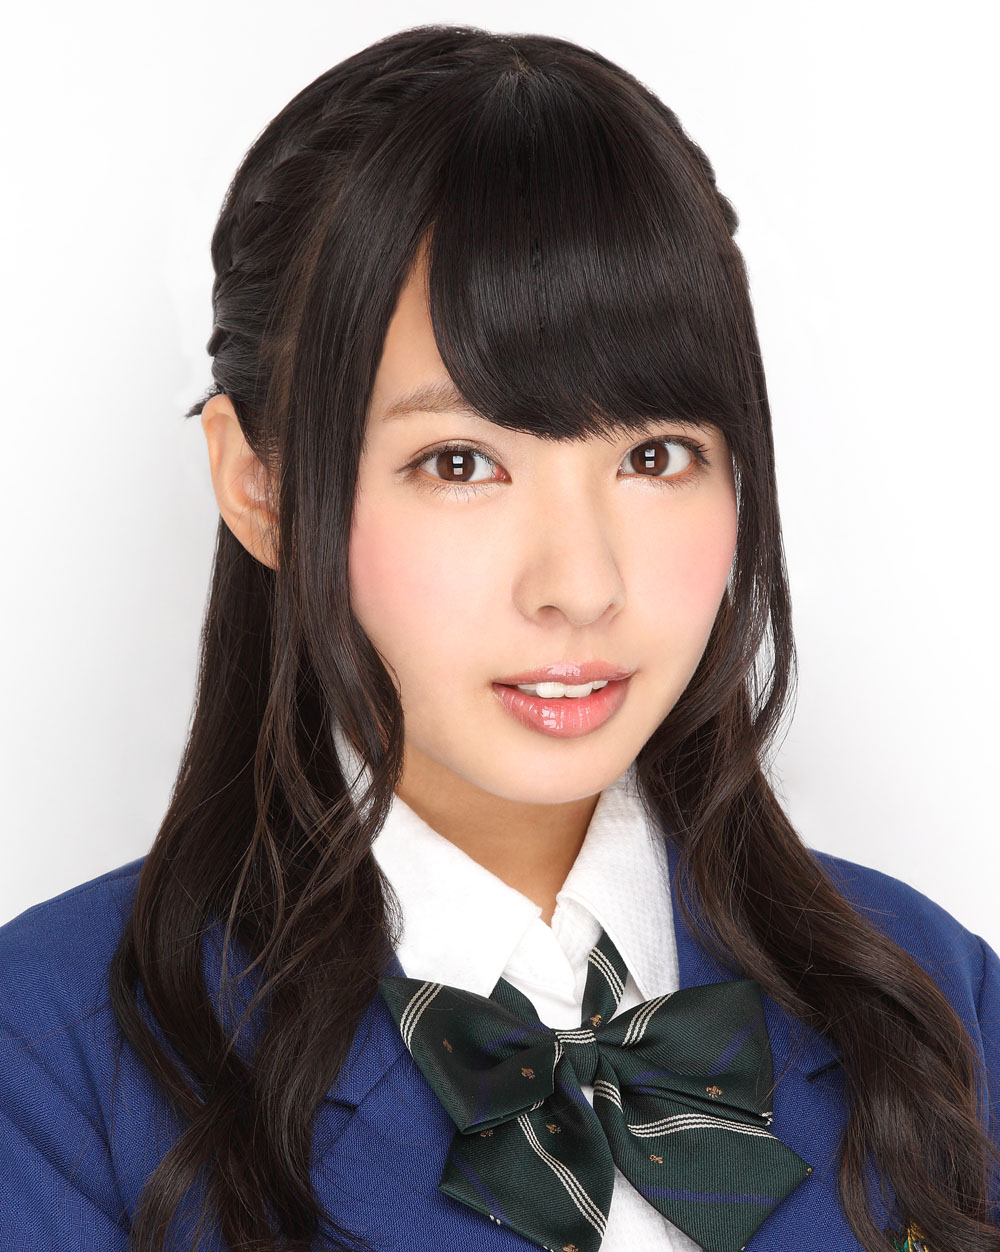 【NMB48卒業セレモニー】山田菜々はなぜ卒業した?中山優馬が弟!?のサムネイル画像